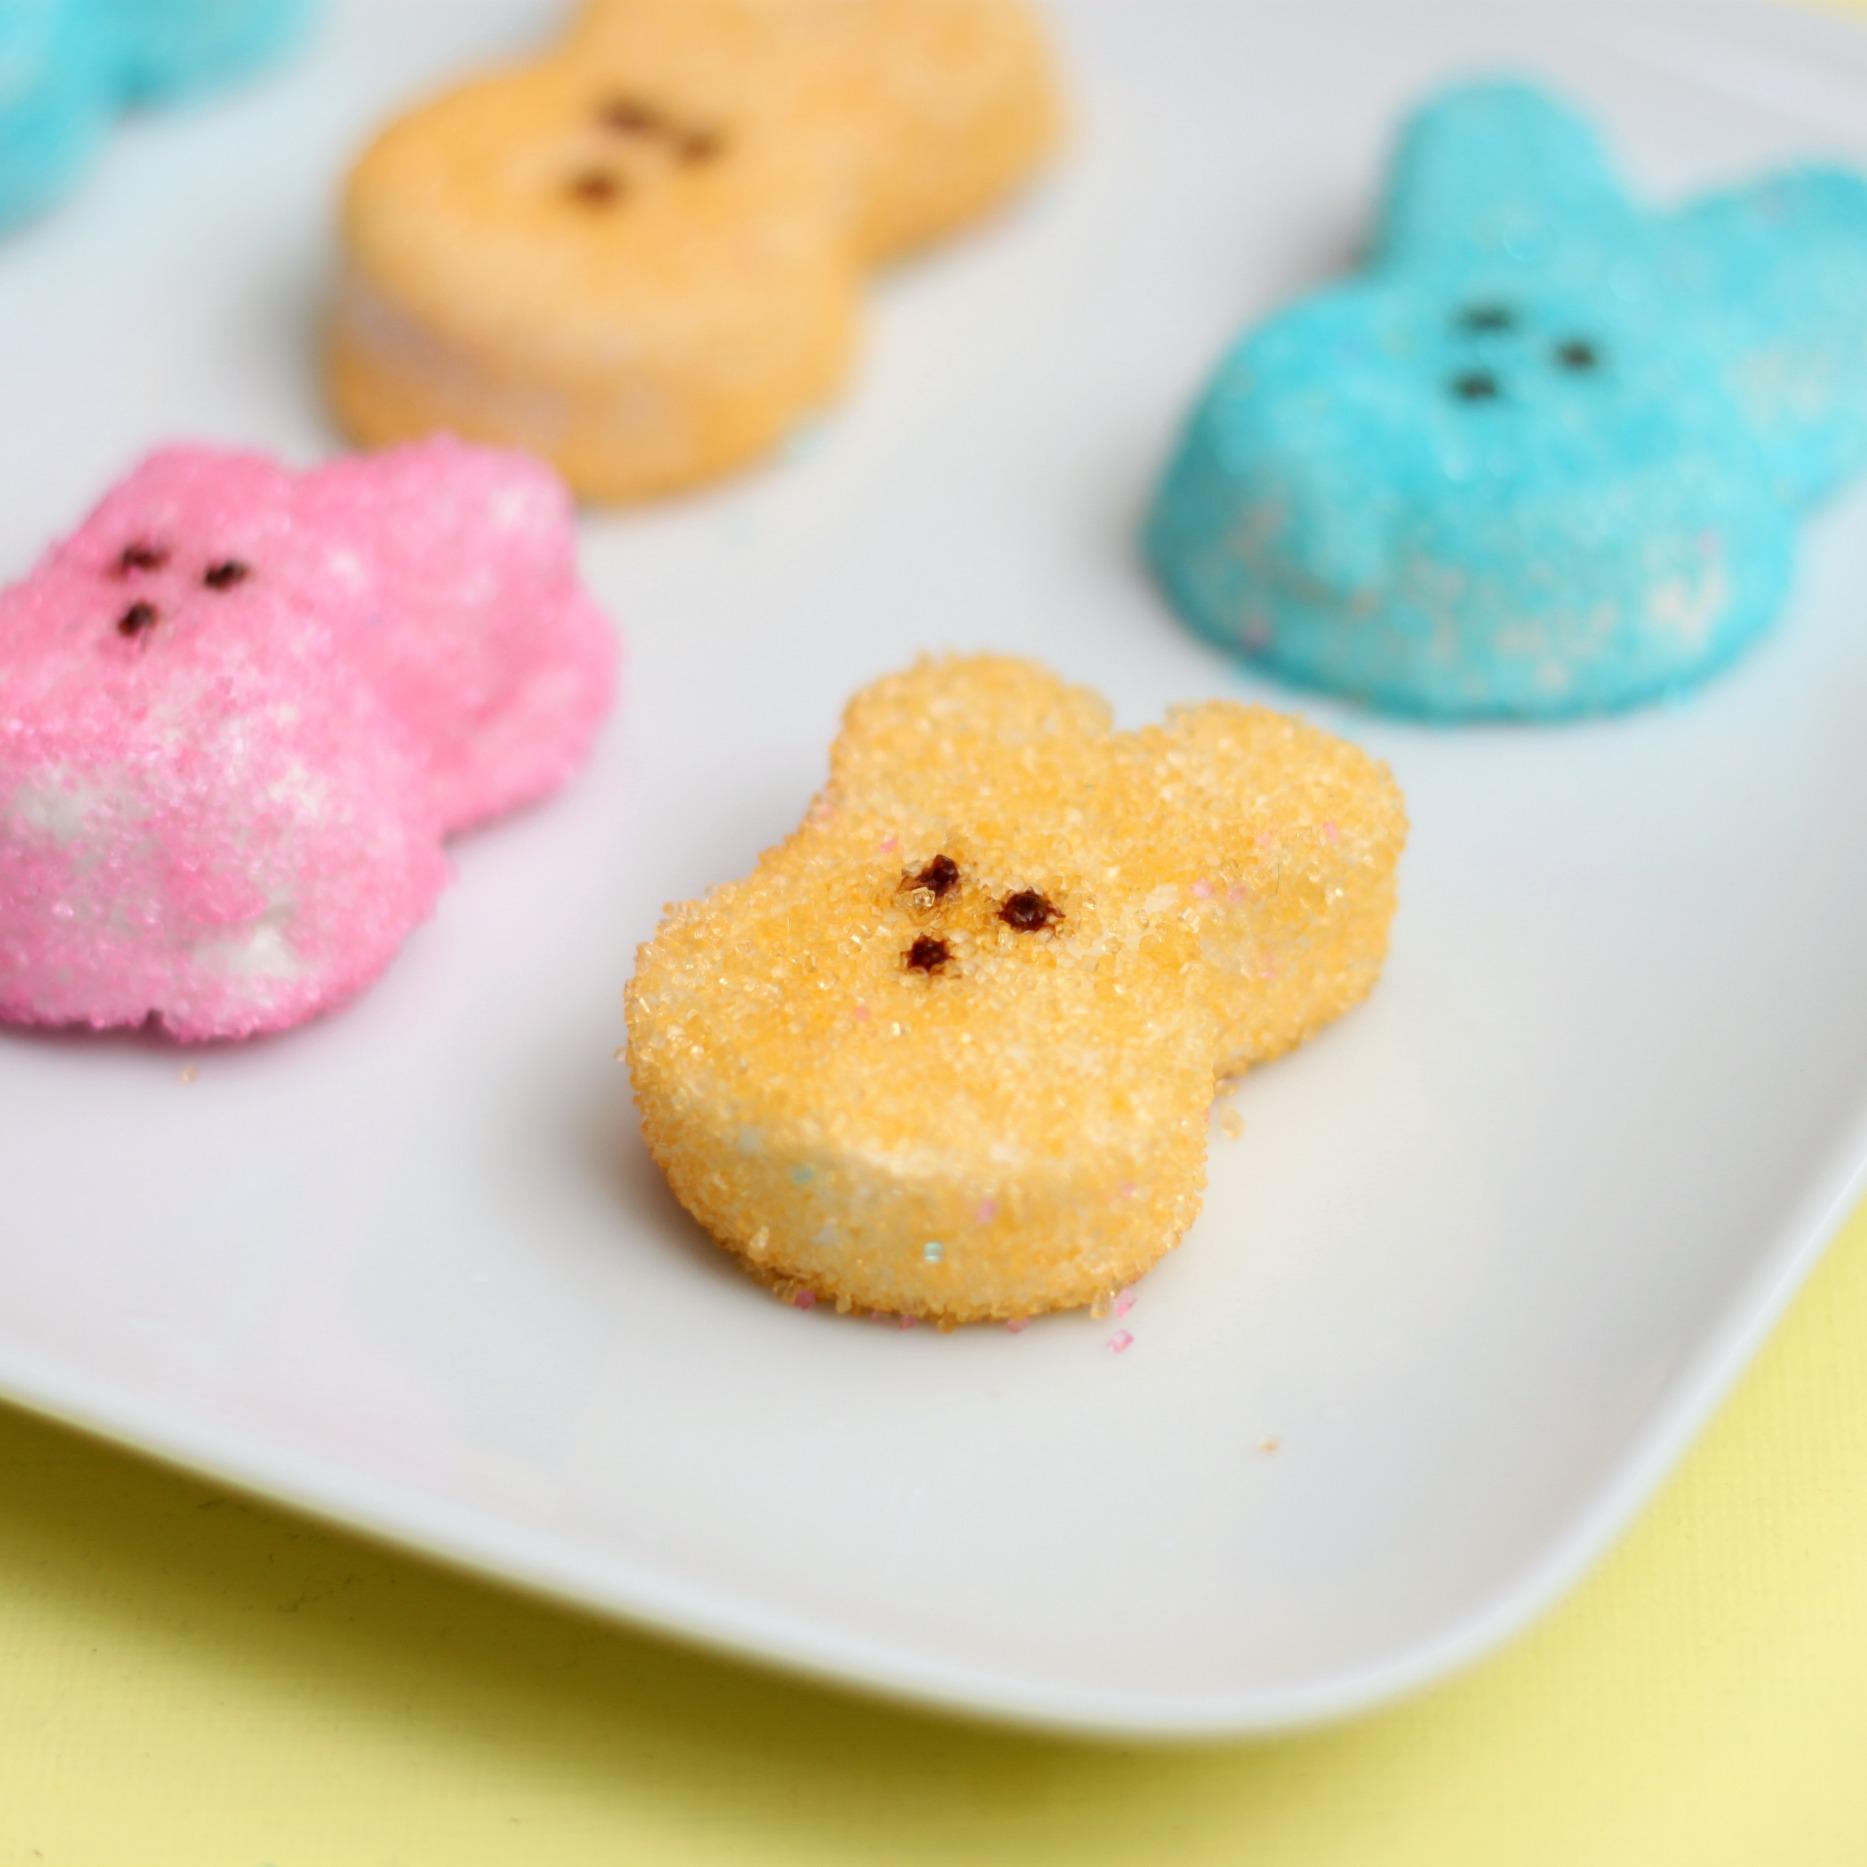 Homemade marshmallow peeps 3 square